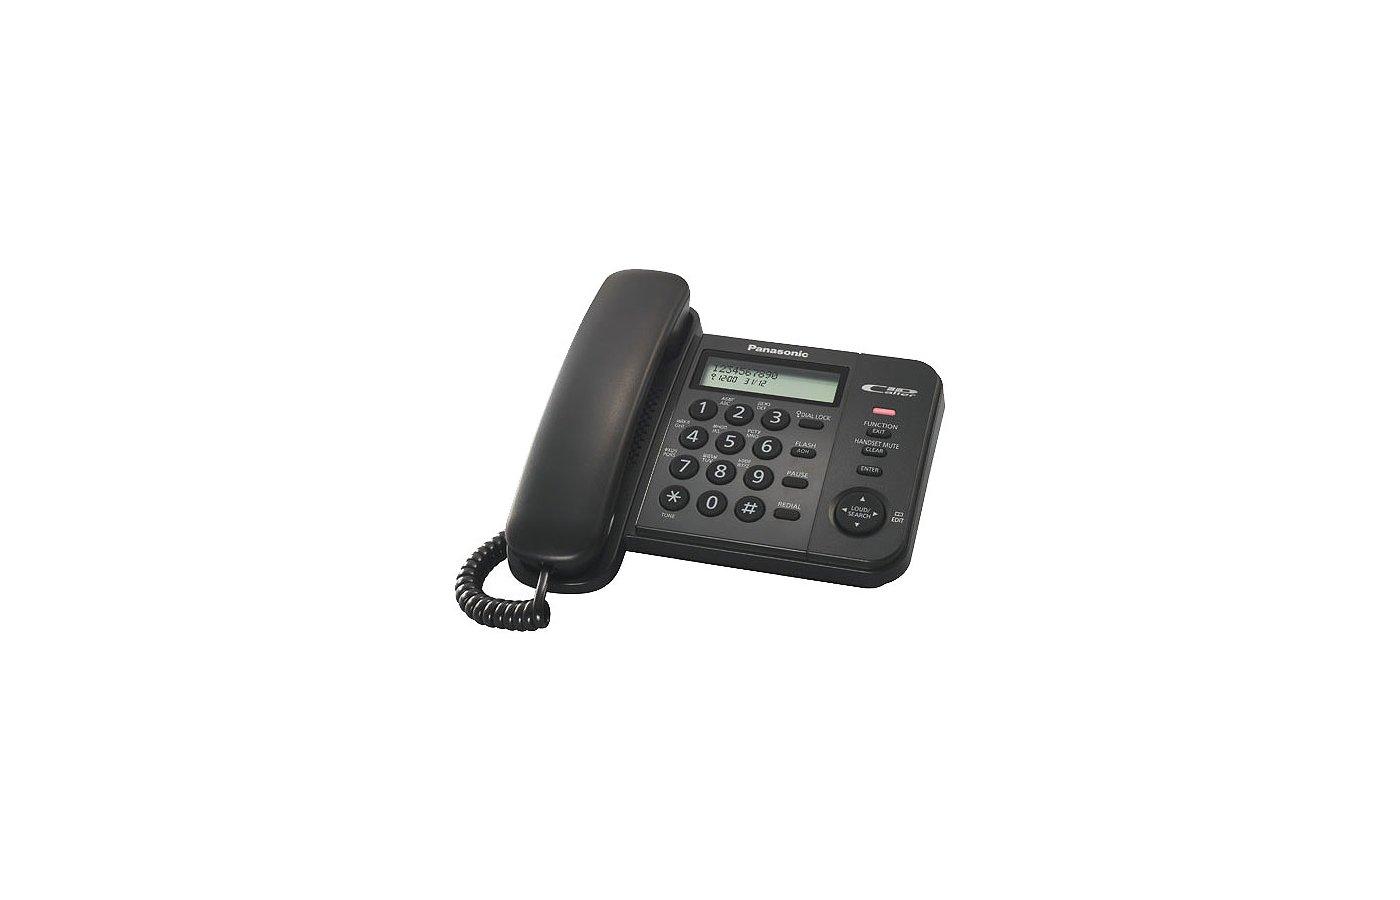 Проводной телефон PANASONIC KX-TS 2356RUB